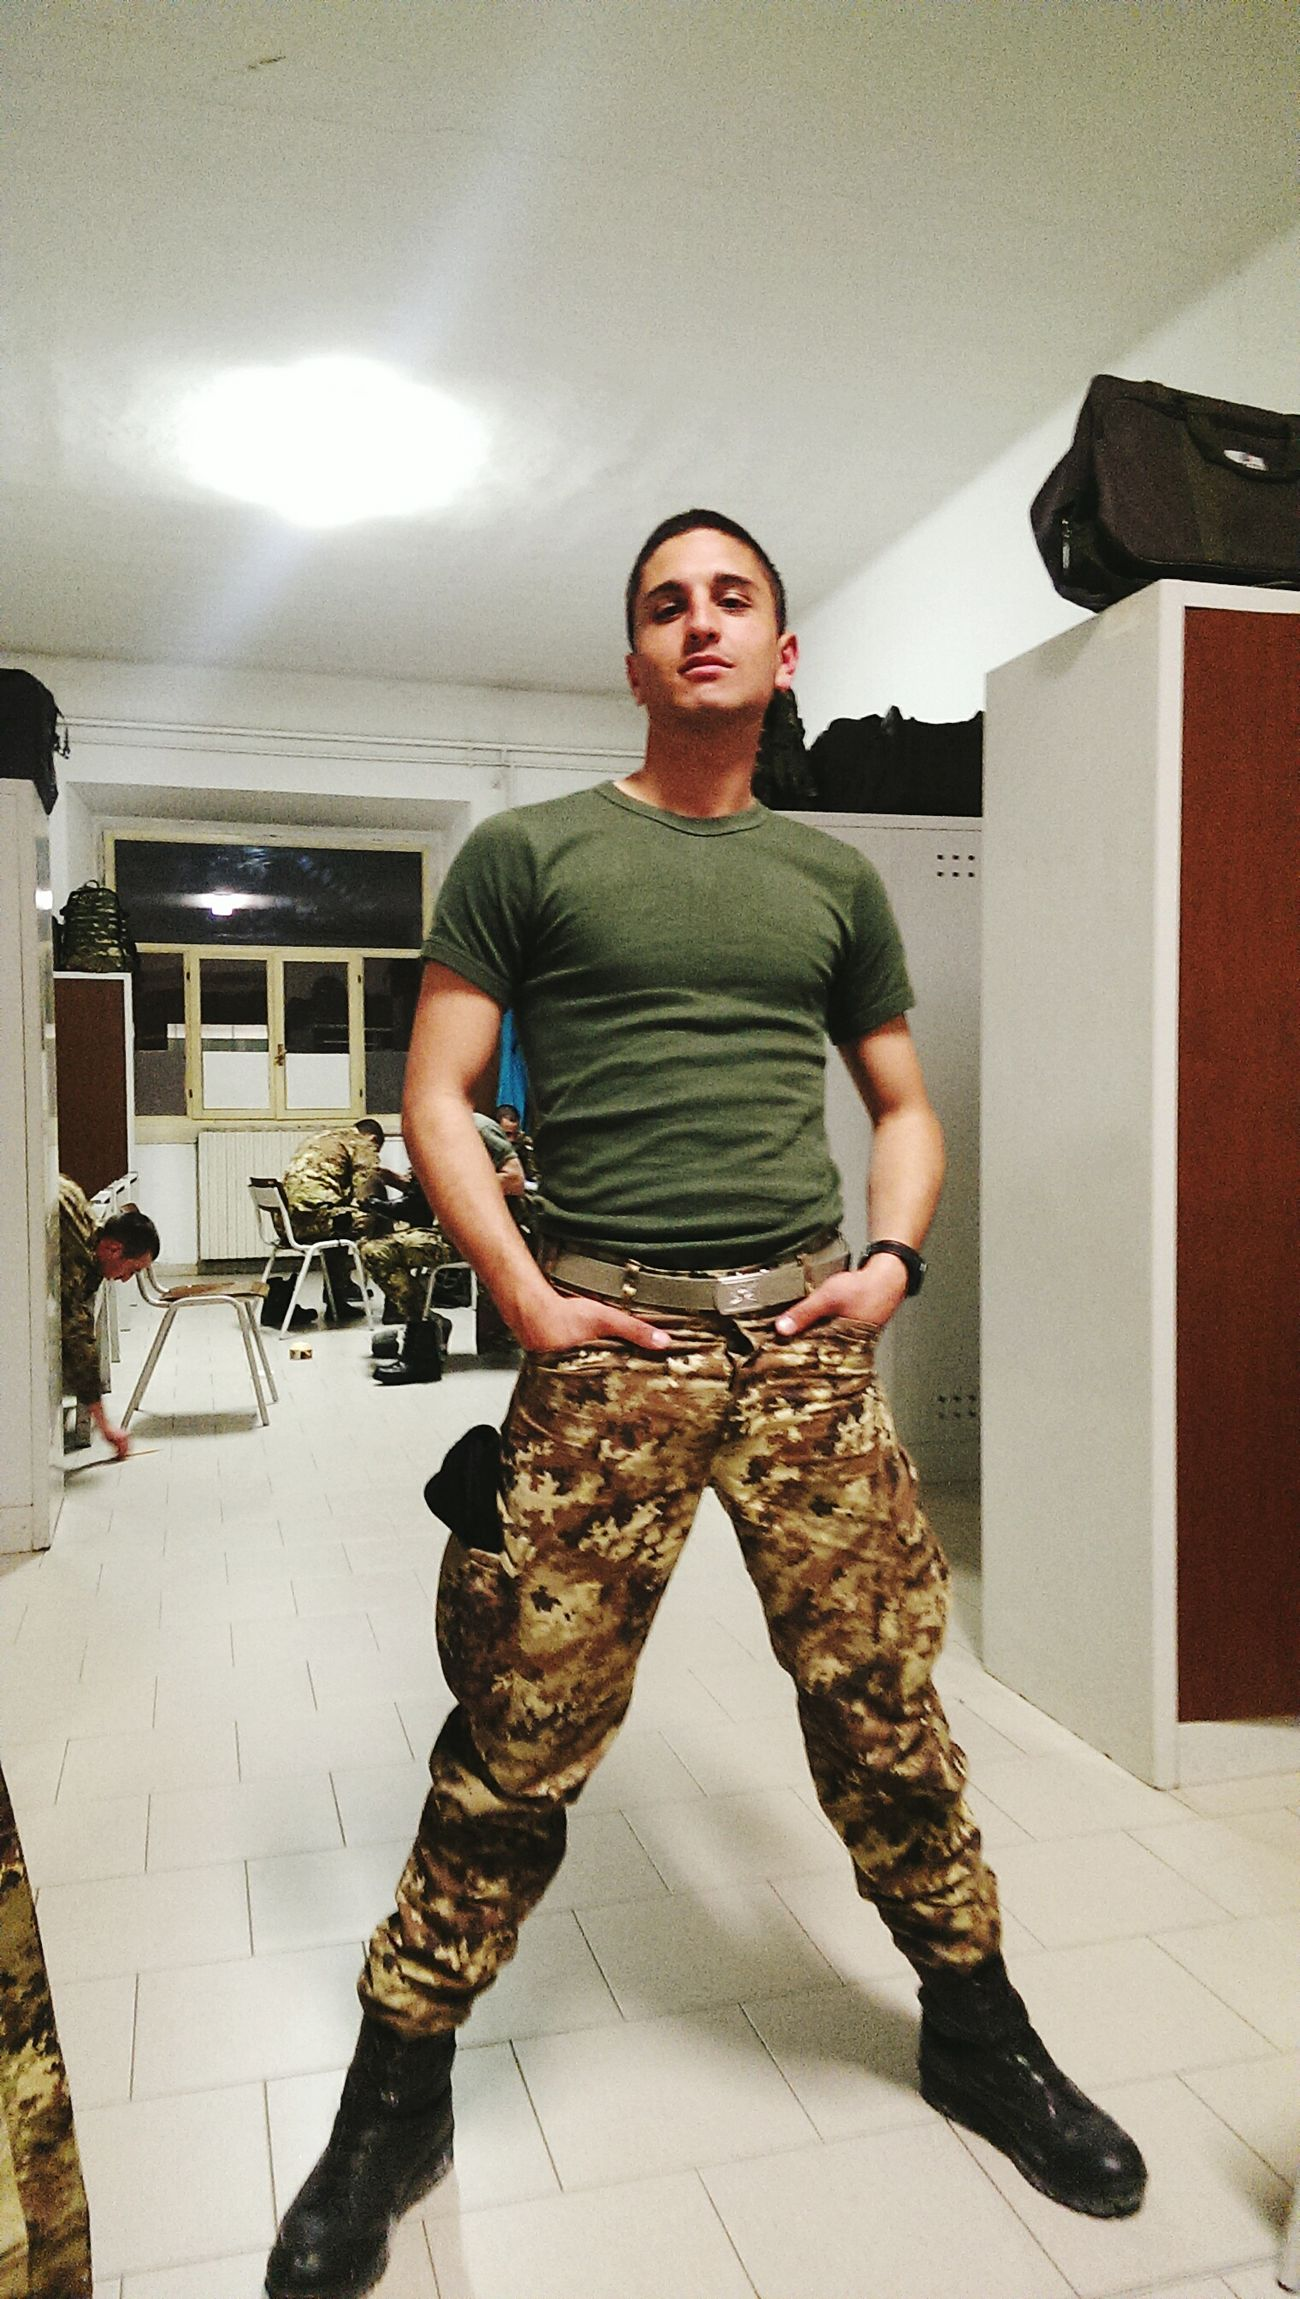 Esercitoitaliano Myself I'm Army Army Life